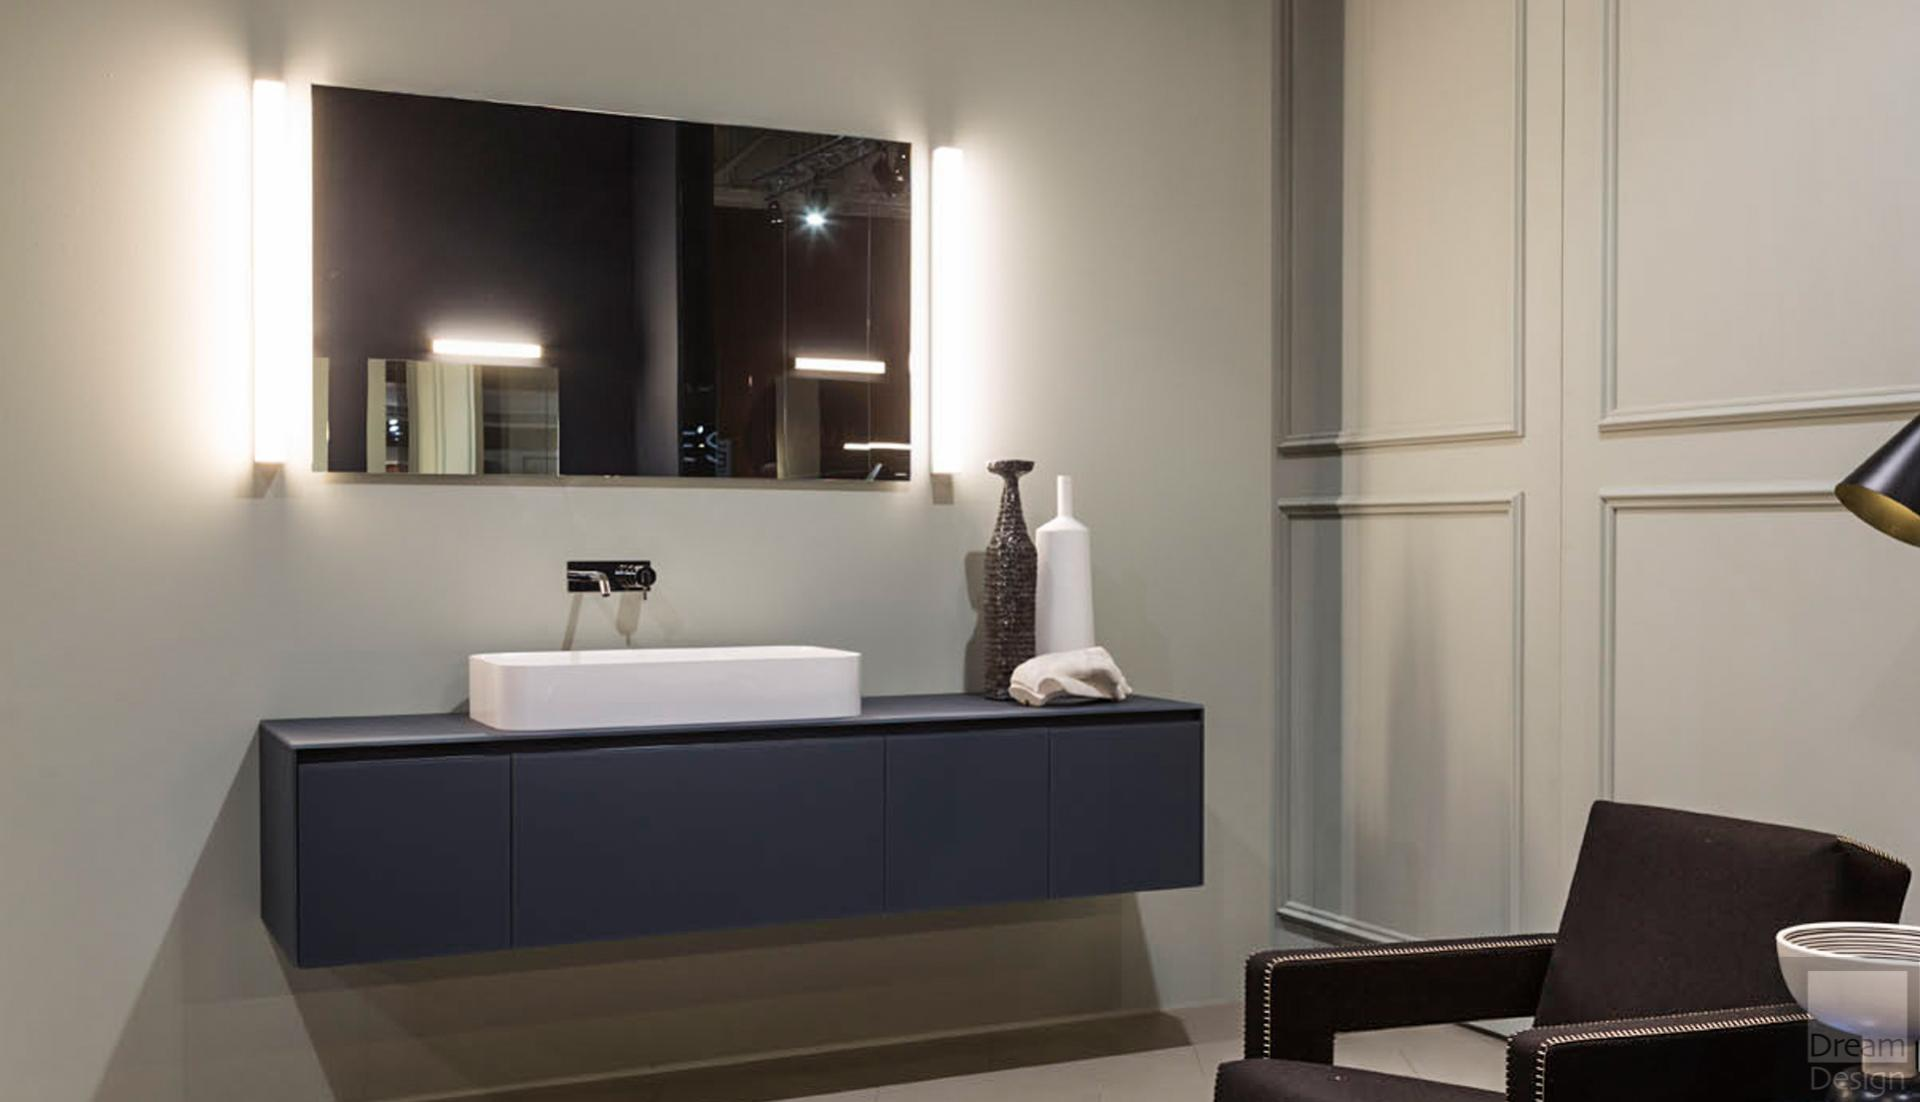 antonio lupi piana dream design interiors ltd. Black Bedroom Furniture Sets. Home Design Ideas